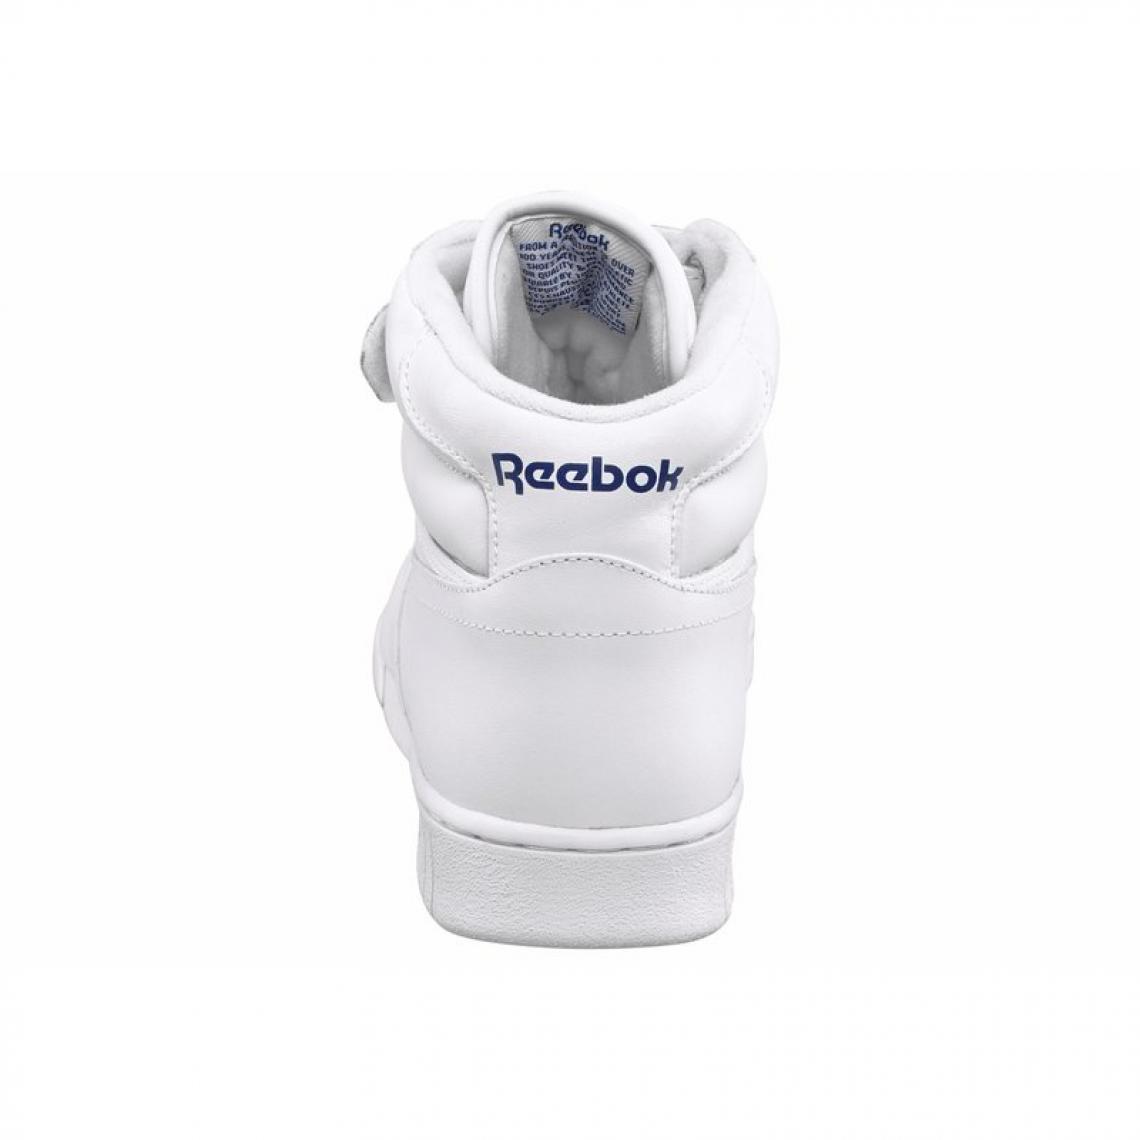 3e98fc7a09b Reebok Ex-O-Fit Hi sneakers montantes cuir à scratch homme - Blanc Reebok